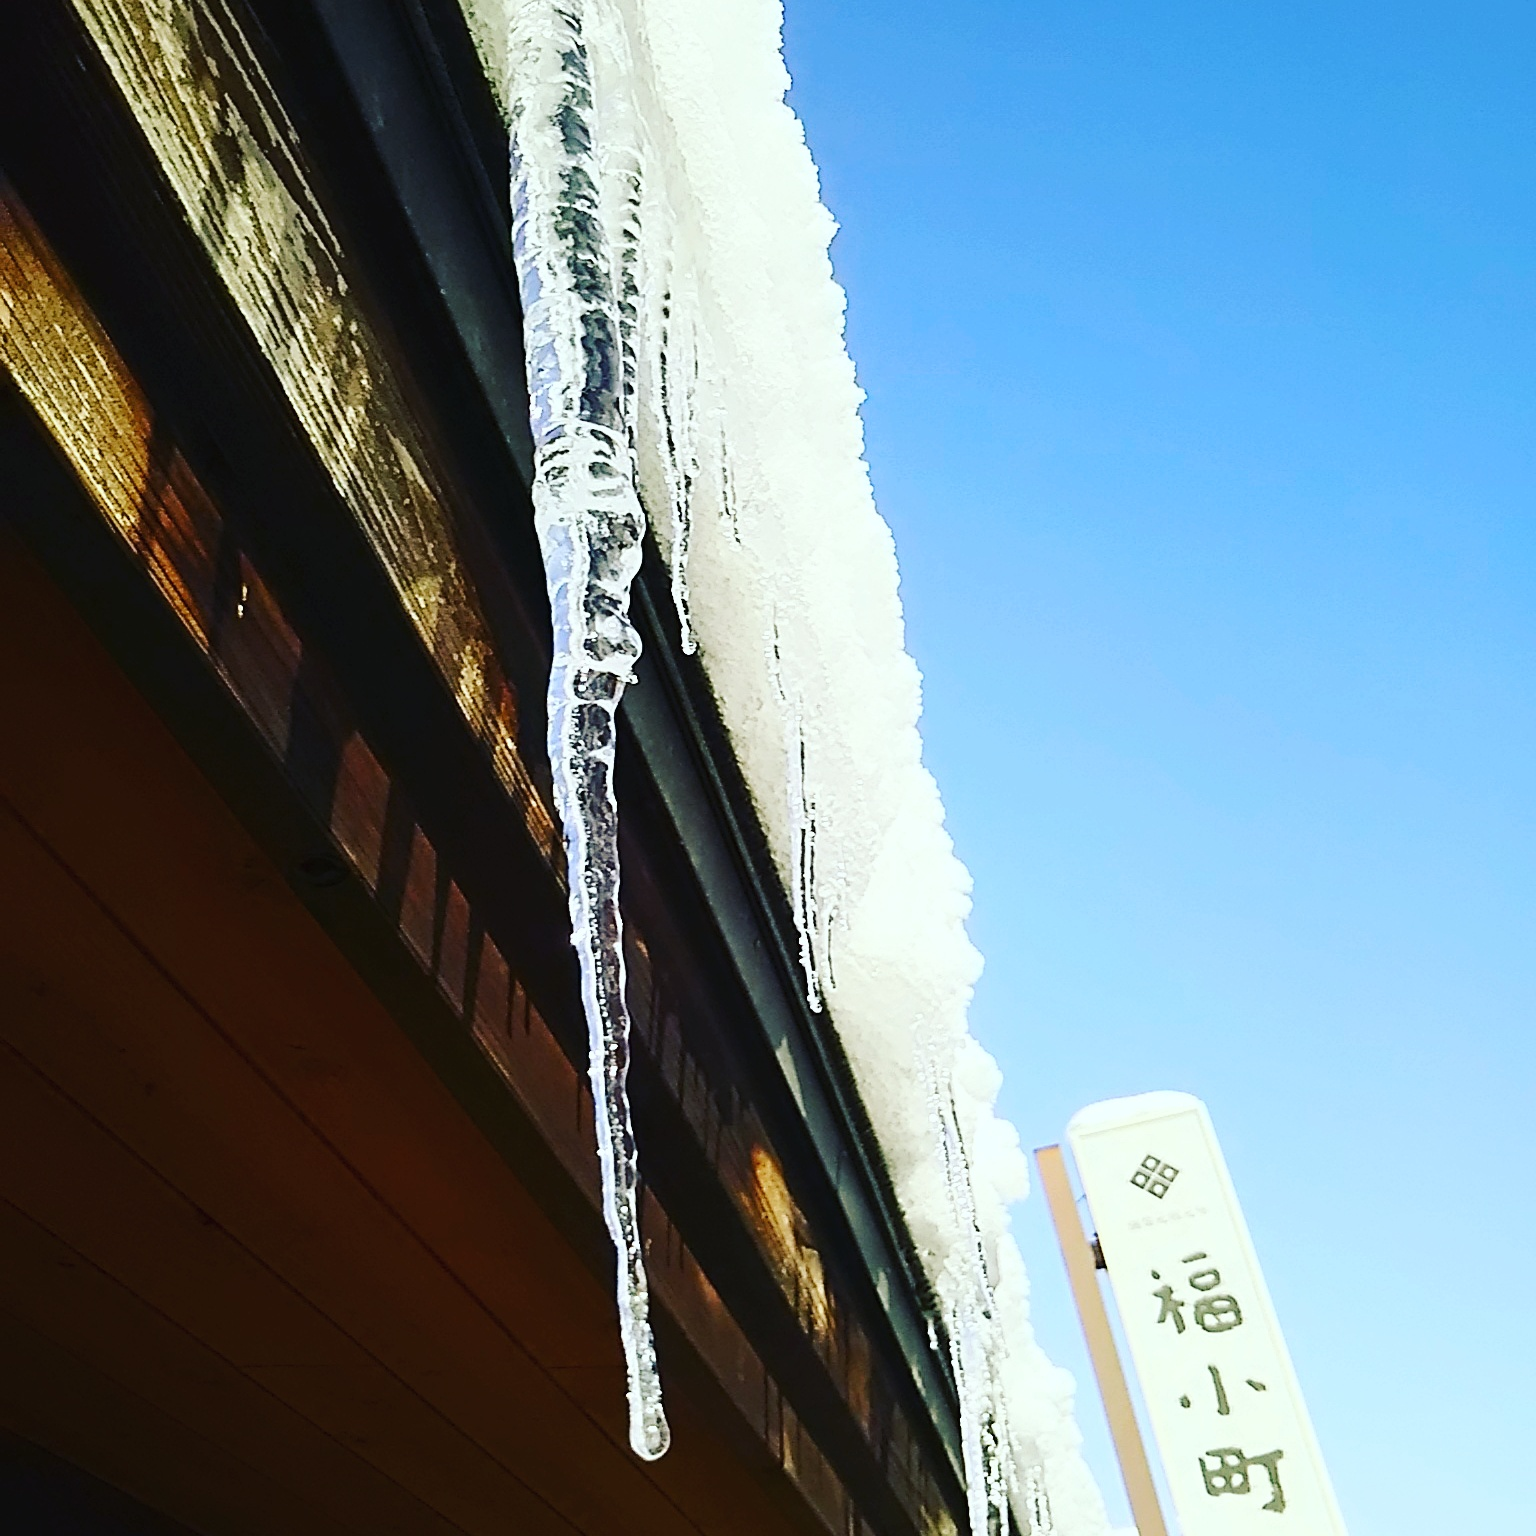 http://www.fukukomachi.com/blog/photo/IMG_20171221_085801_045.jpg